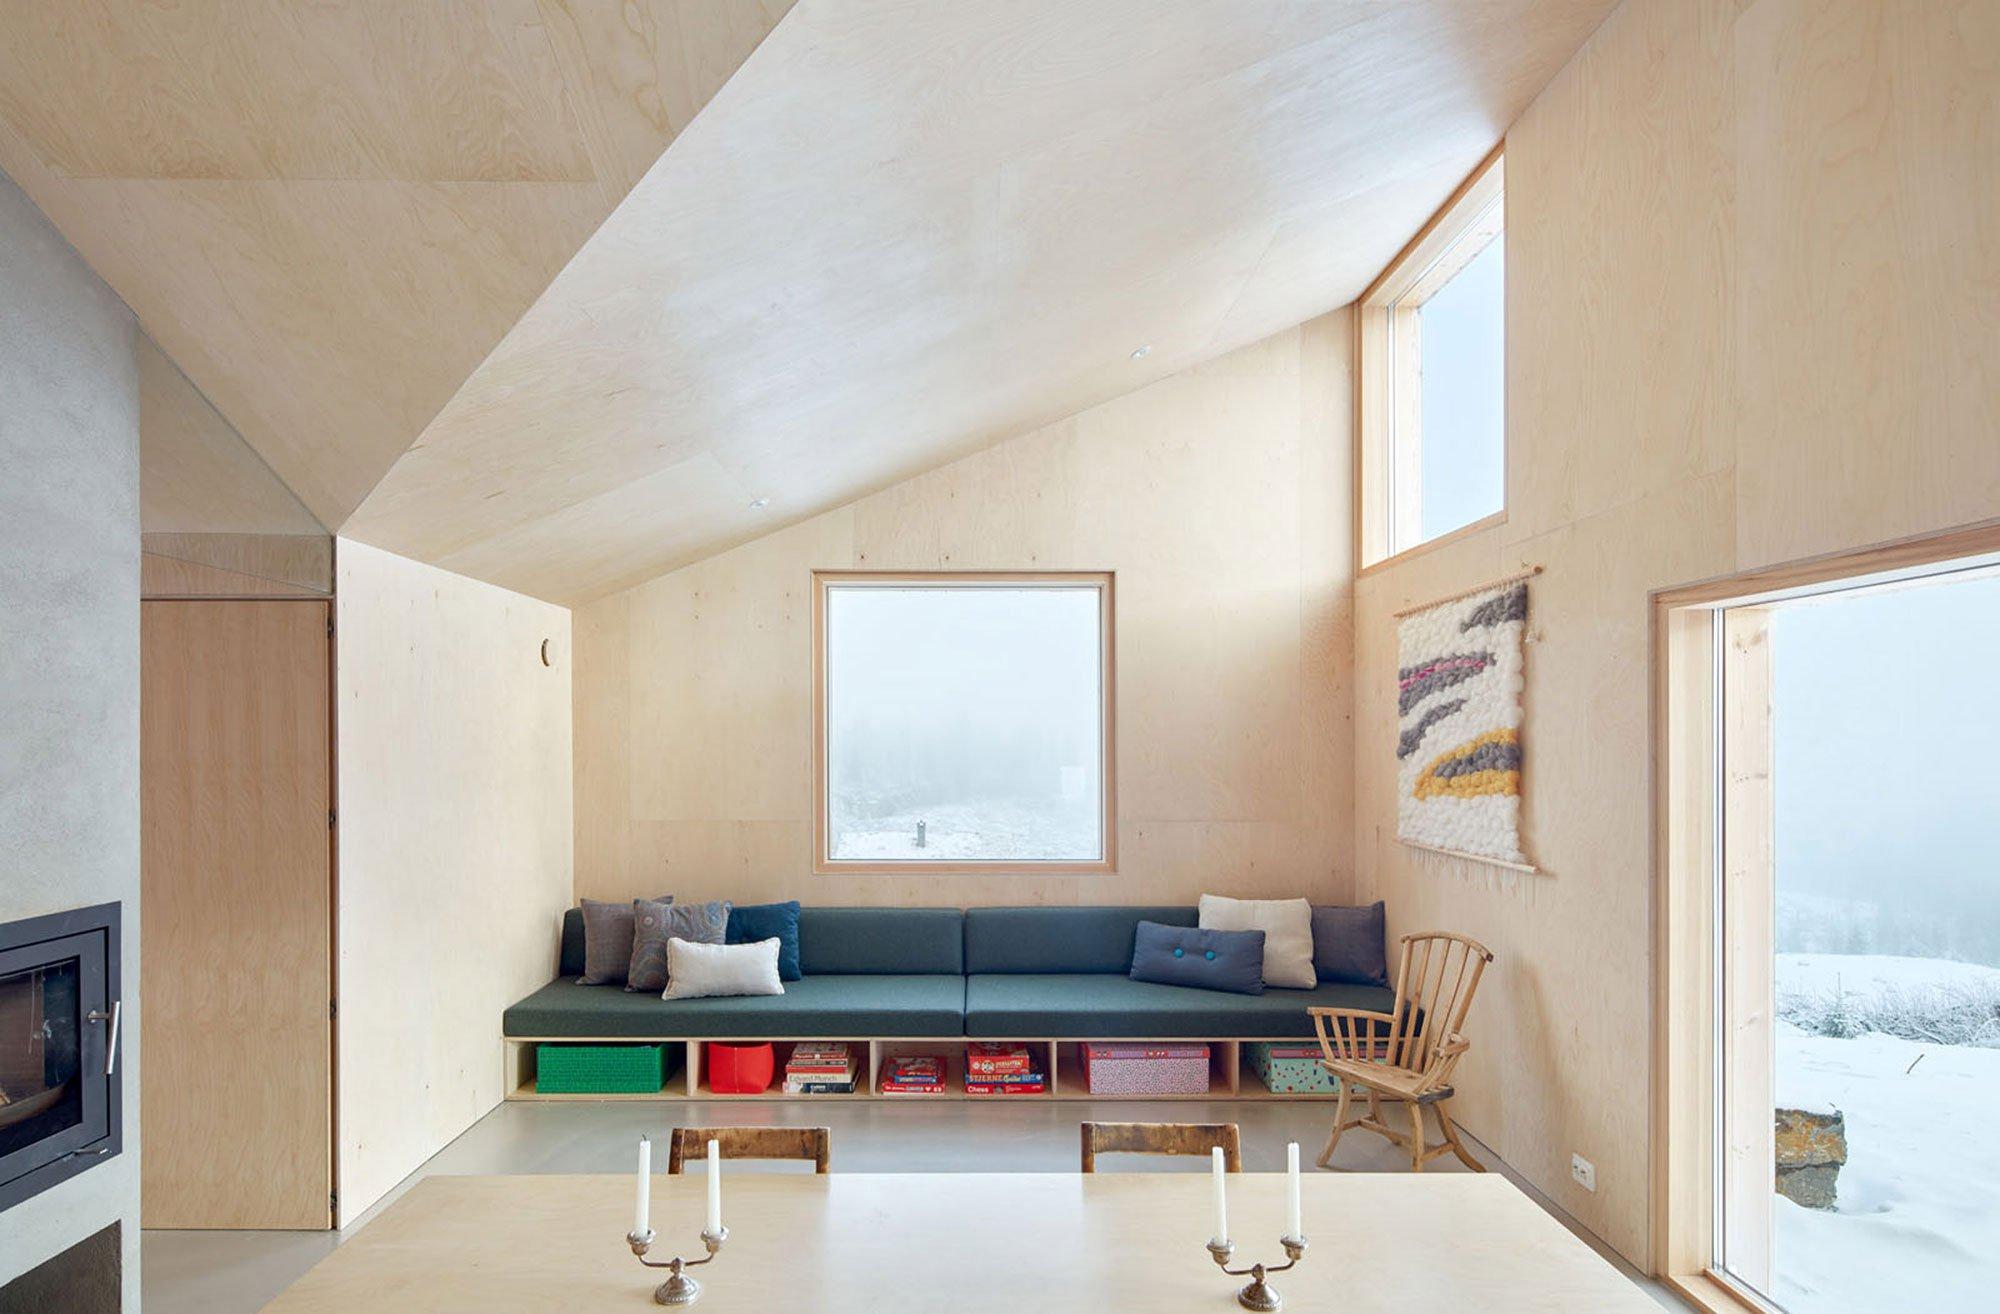 mylla-house-Mork-Ulnes Architects-Bruce-Damonte-02